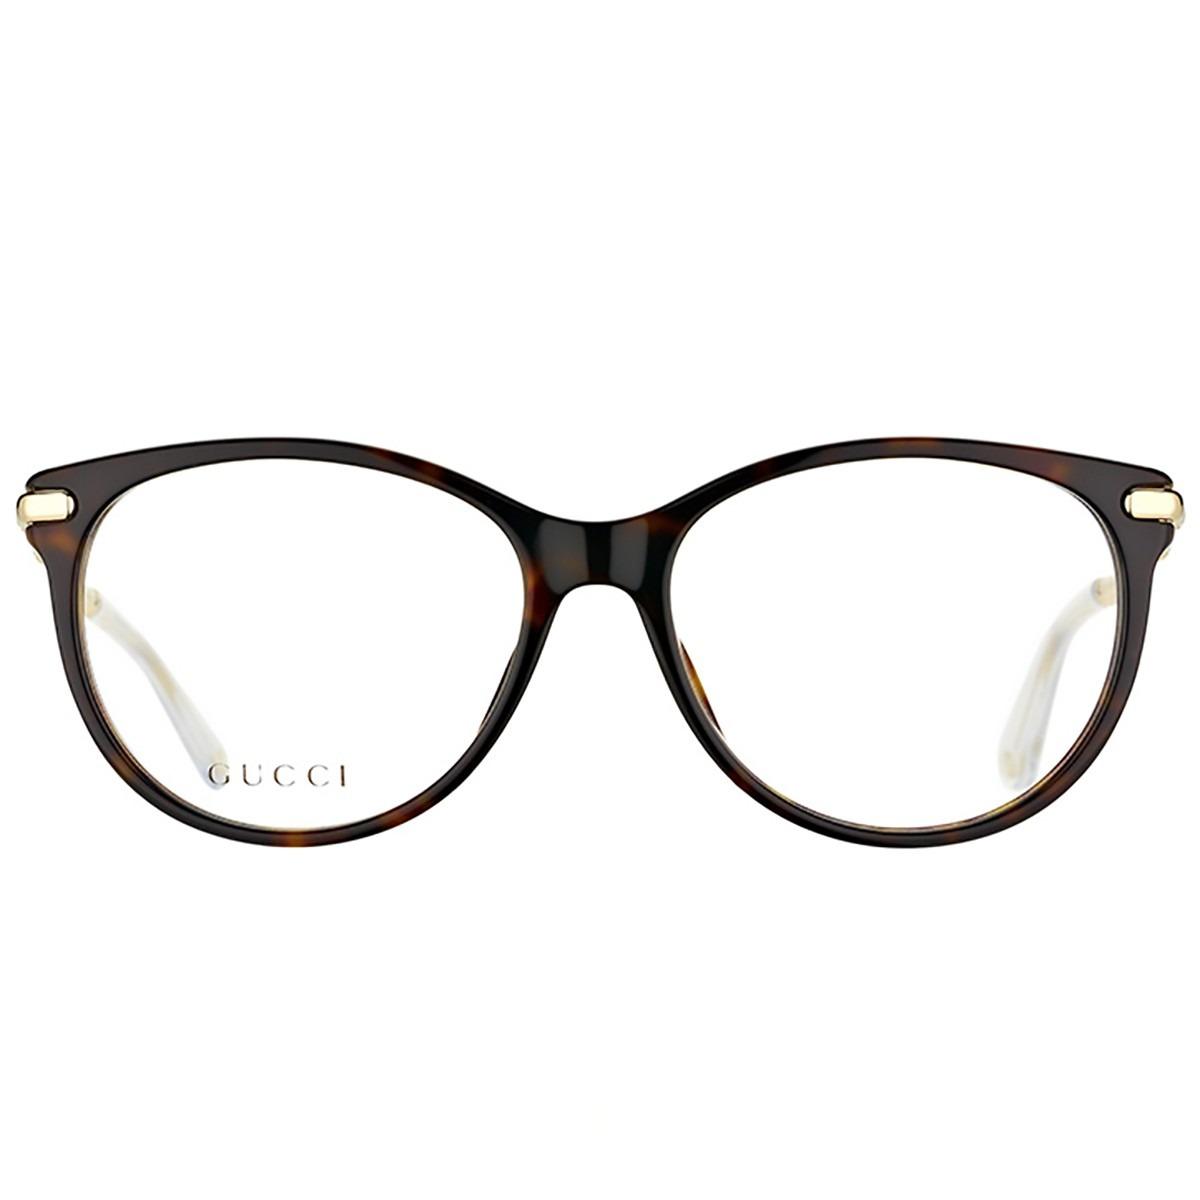 a2a9b02aa8c06 Óculos De Grau Gucci Gg3780 Lvl - R  1.018